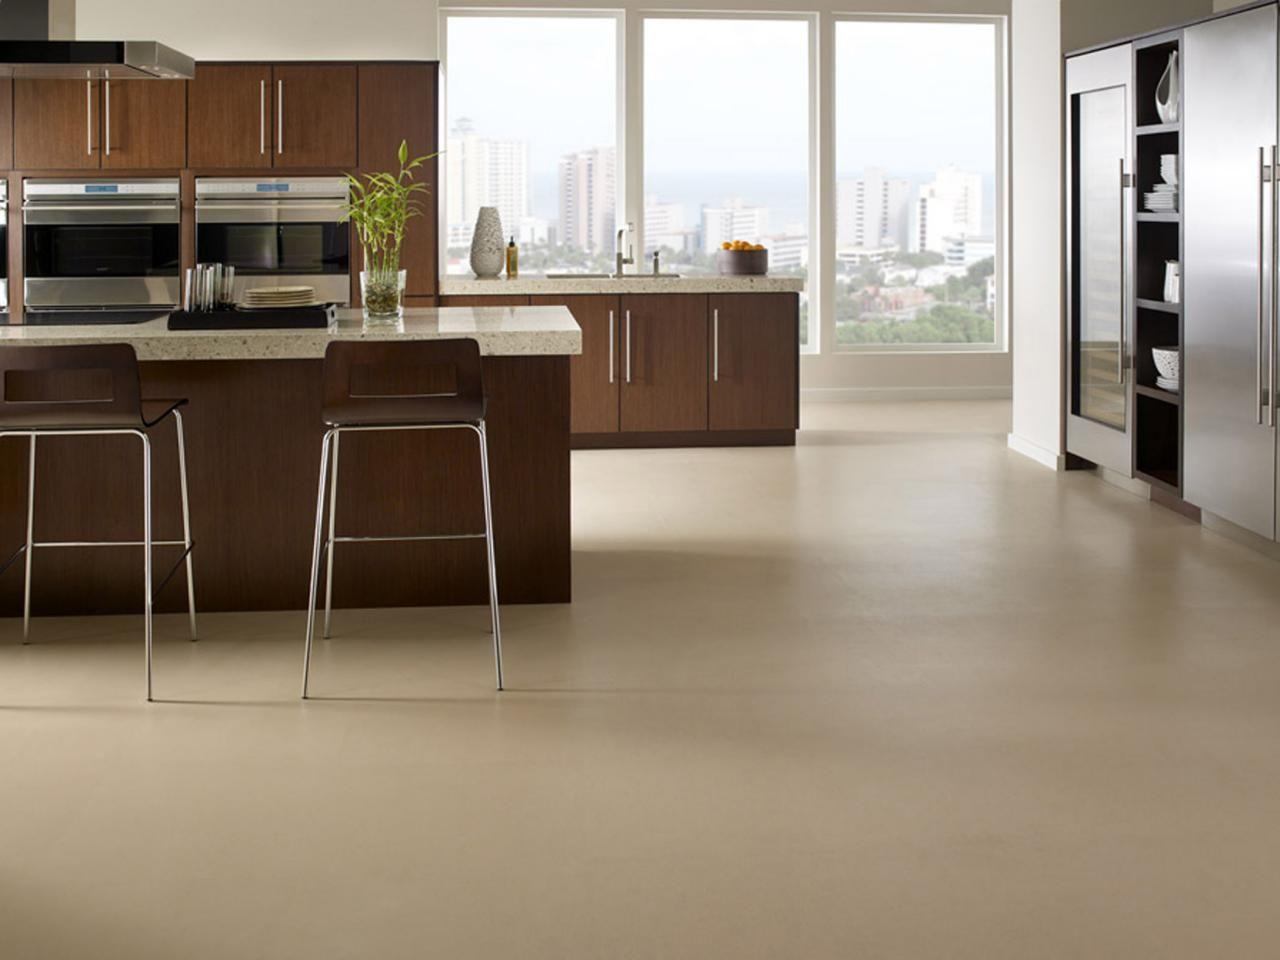 Alternative Kitchen Floor Ideas  Kitchen Floors Hgtv And Kitchen Gorgeous Kitchen Floor Options Decorating Inspiration